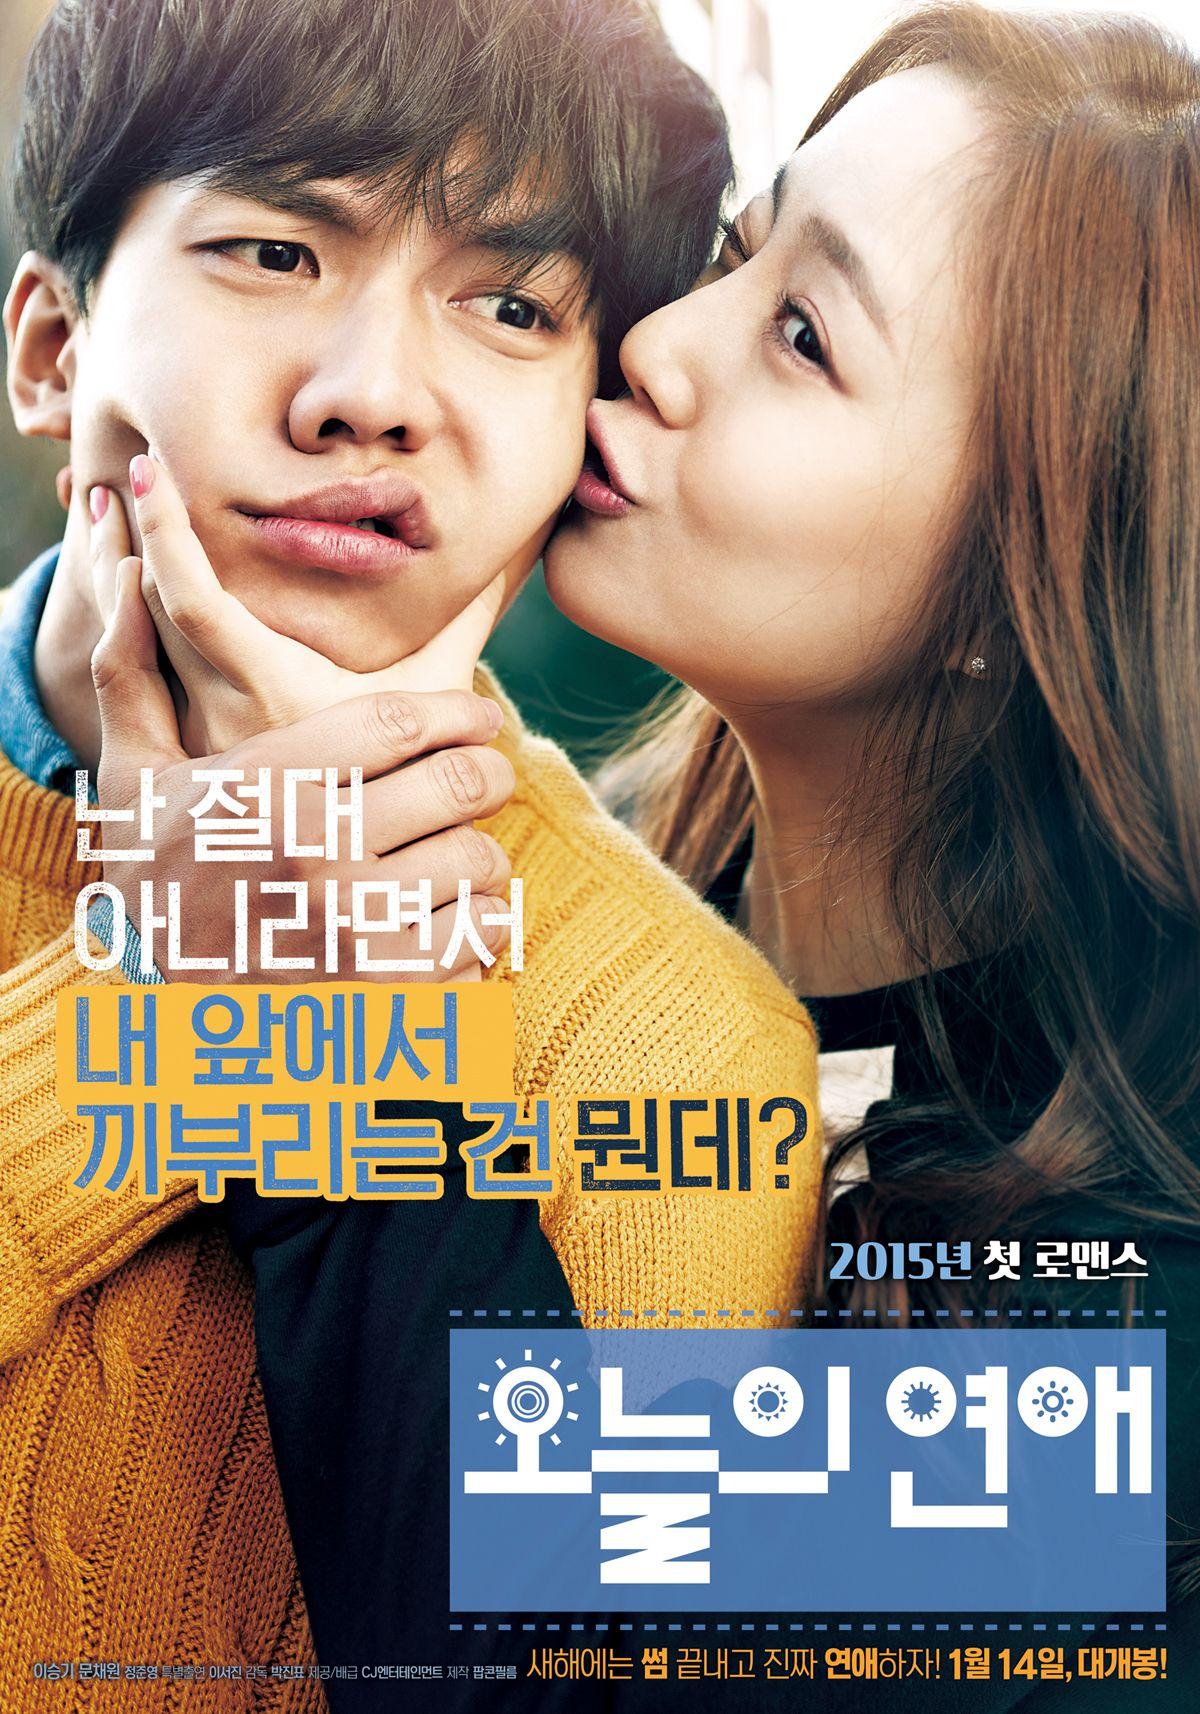 I love asian movies